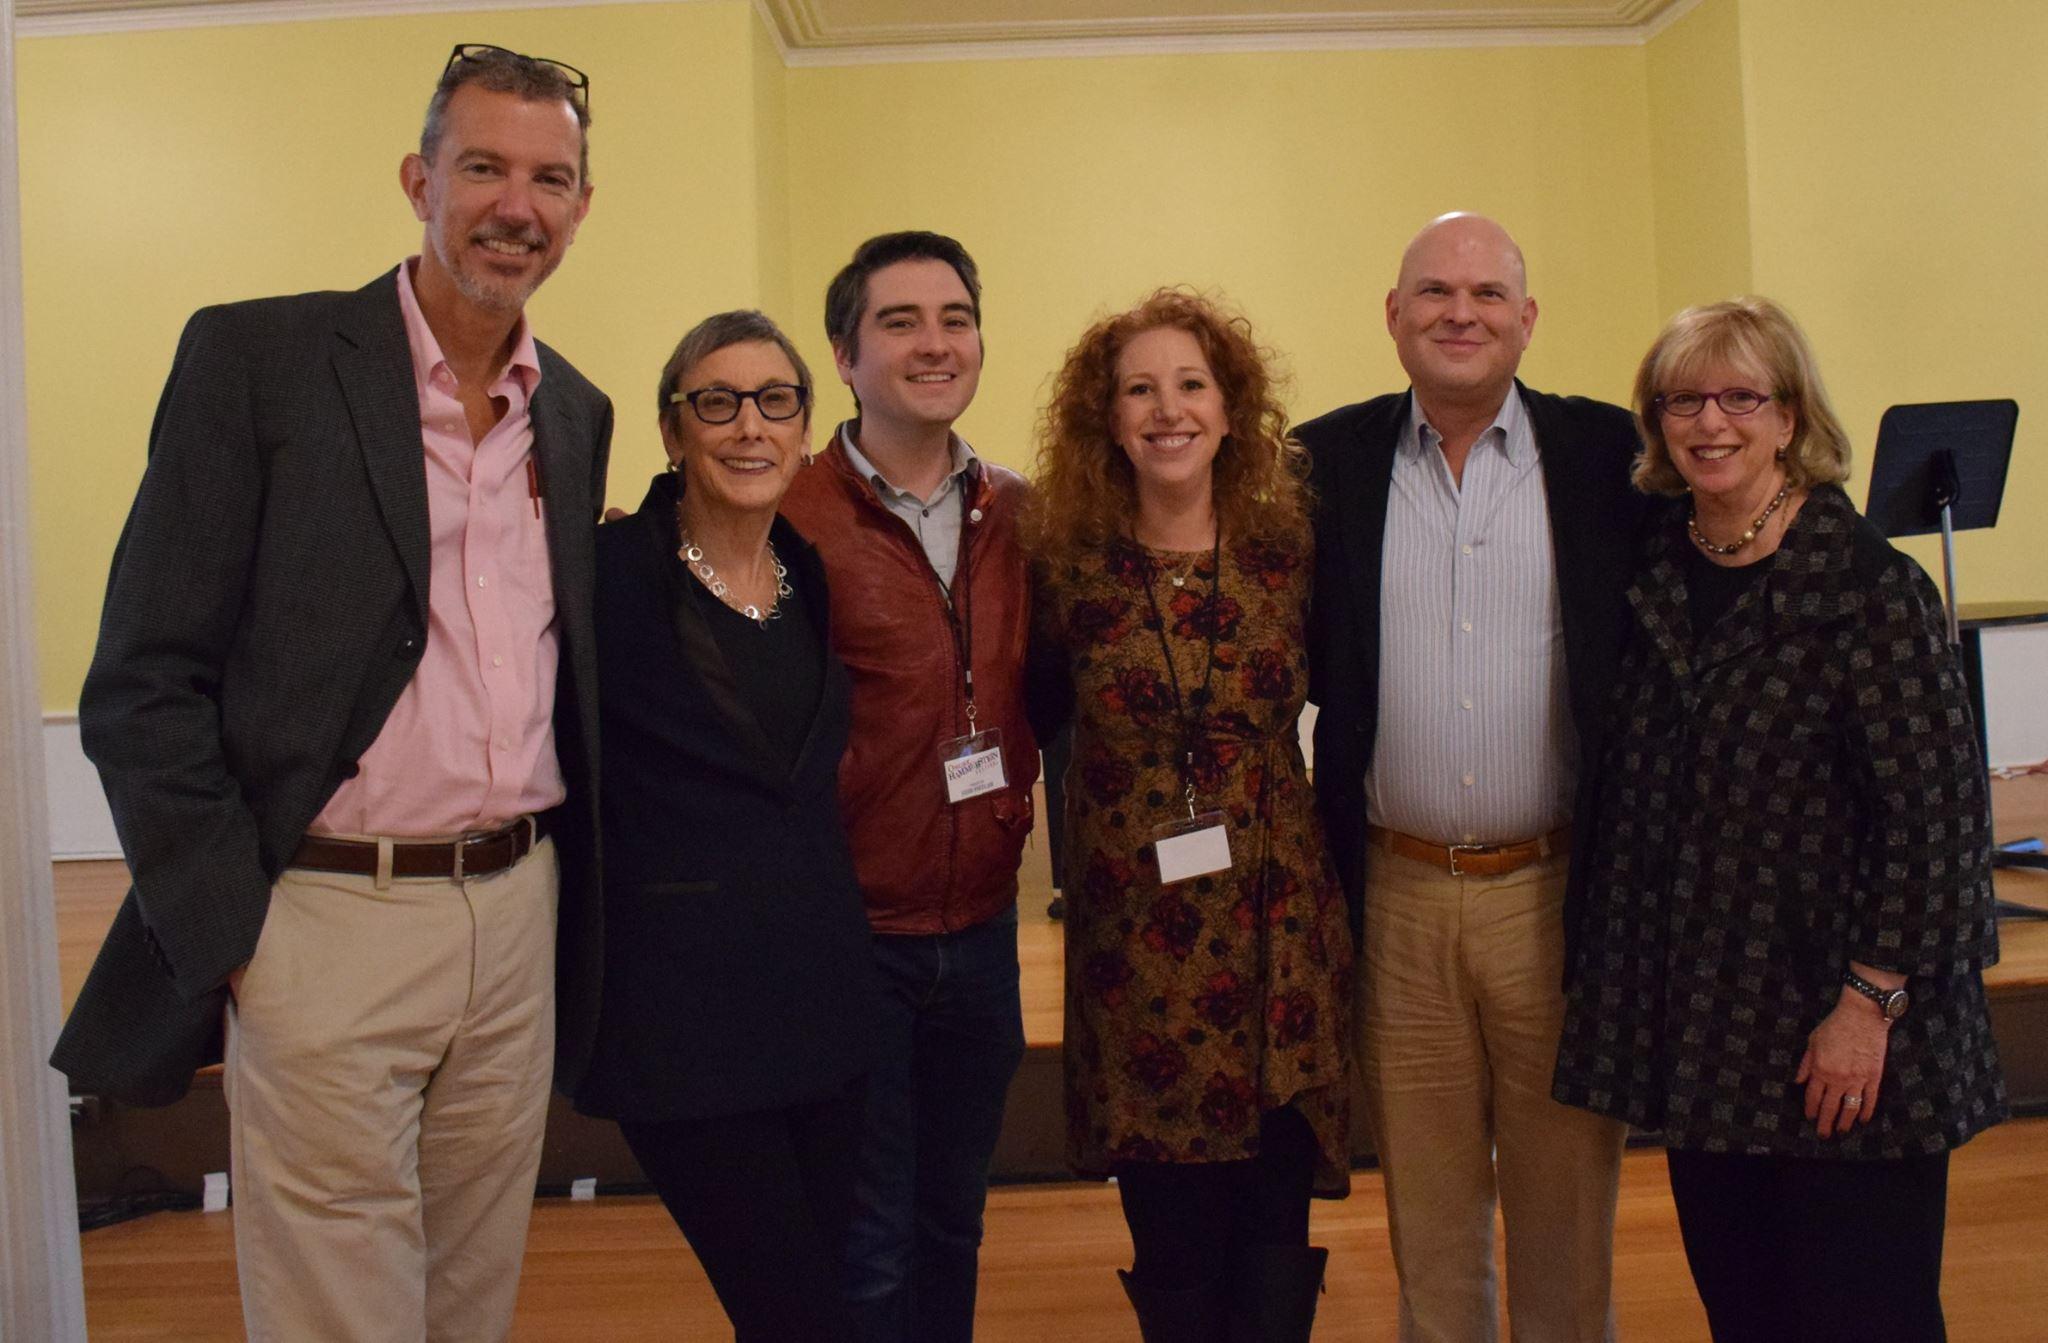 Hope Sharla and Alex, Robyn, Josh and Stephen - Tony winning producers who manage Bucks County Playhouse